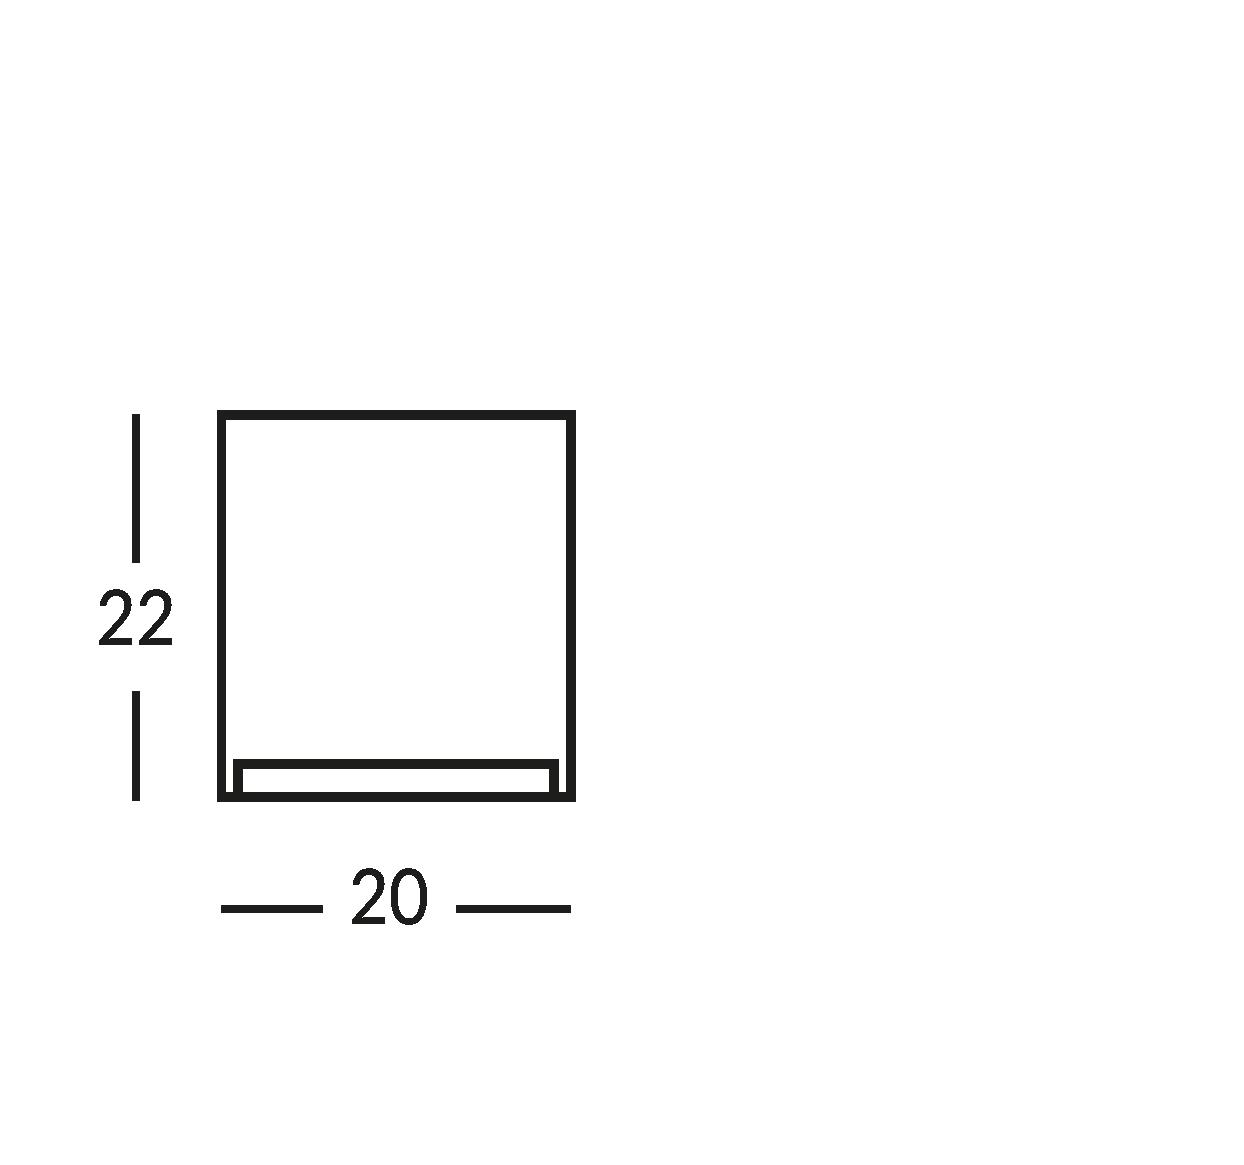 Señal impresa en cristal transparente. cm 20x22